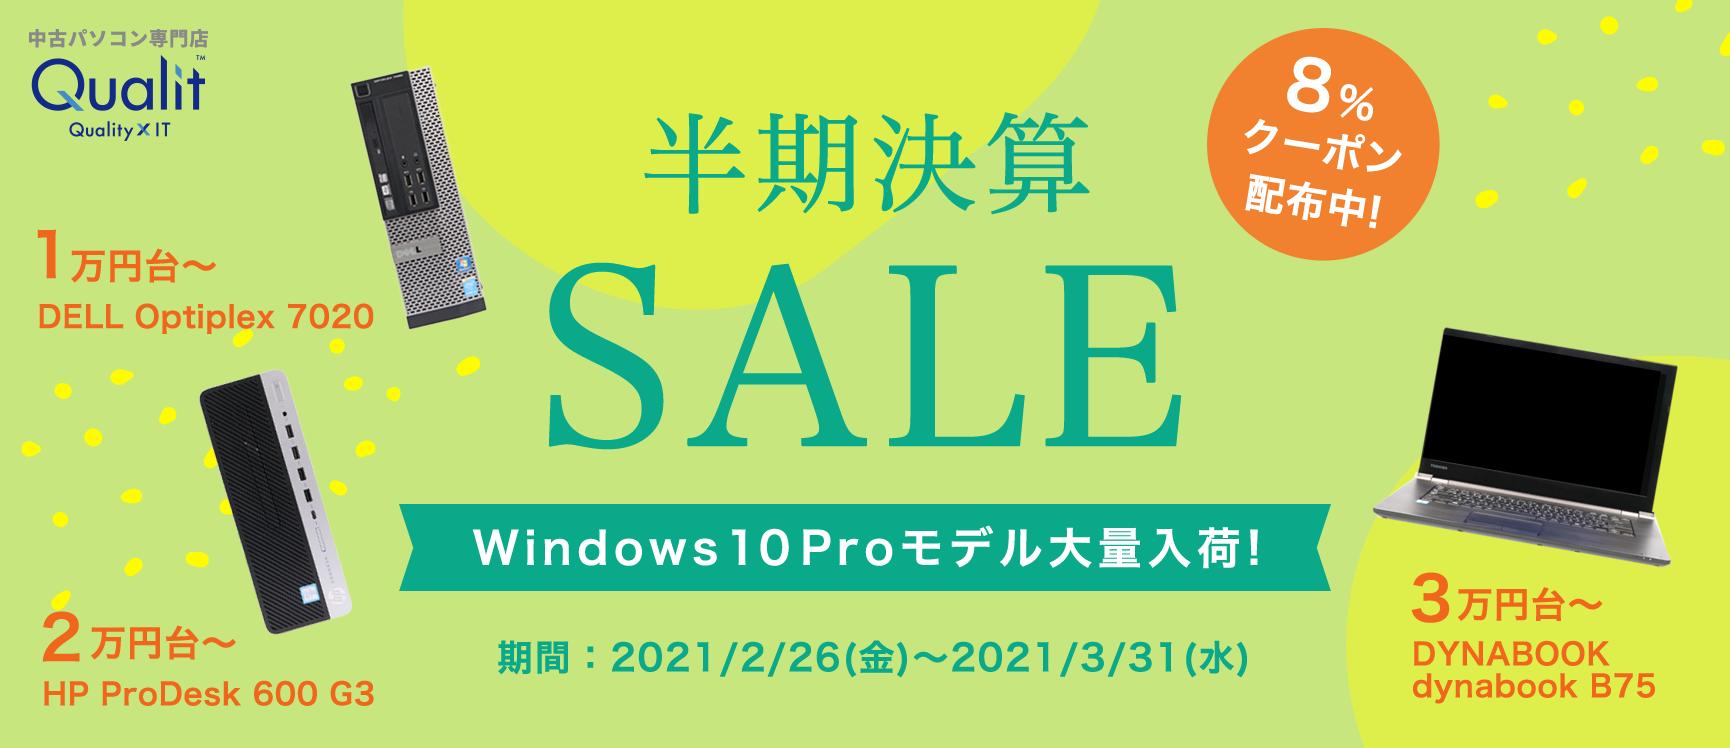 Qualit クオリット 年度末 決算セール Windows 10 Pro 大量入荷!